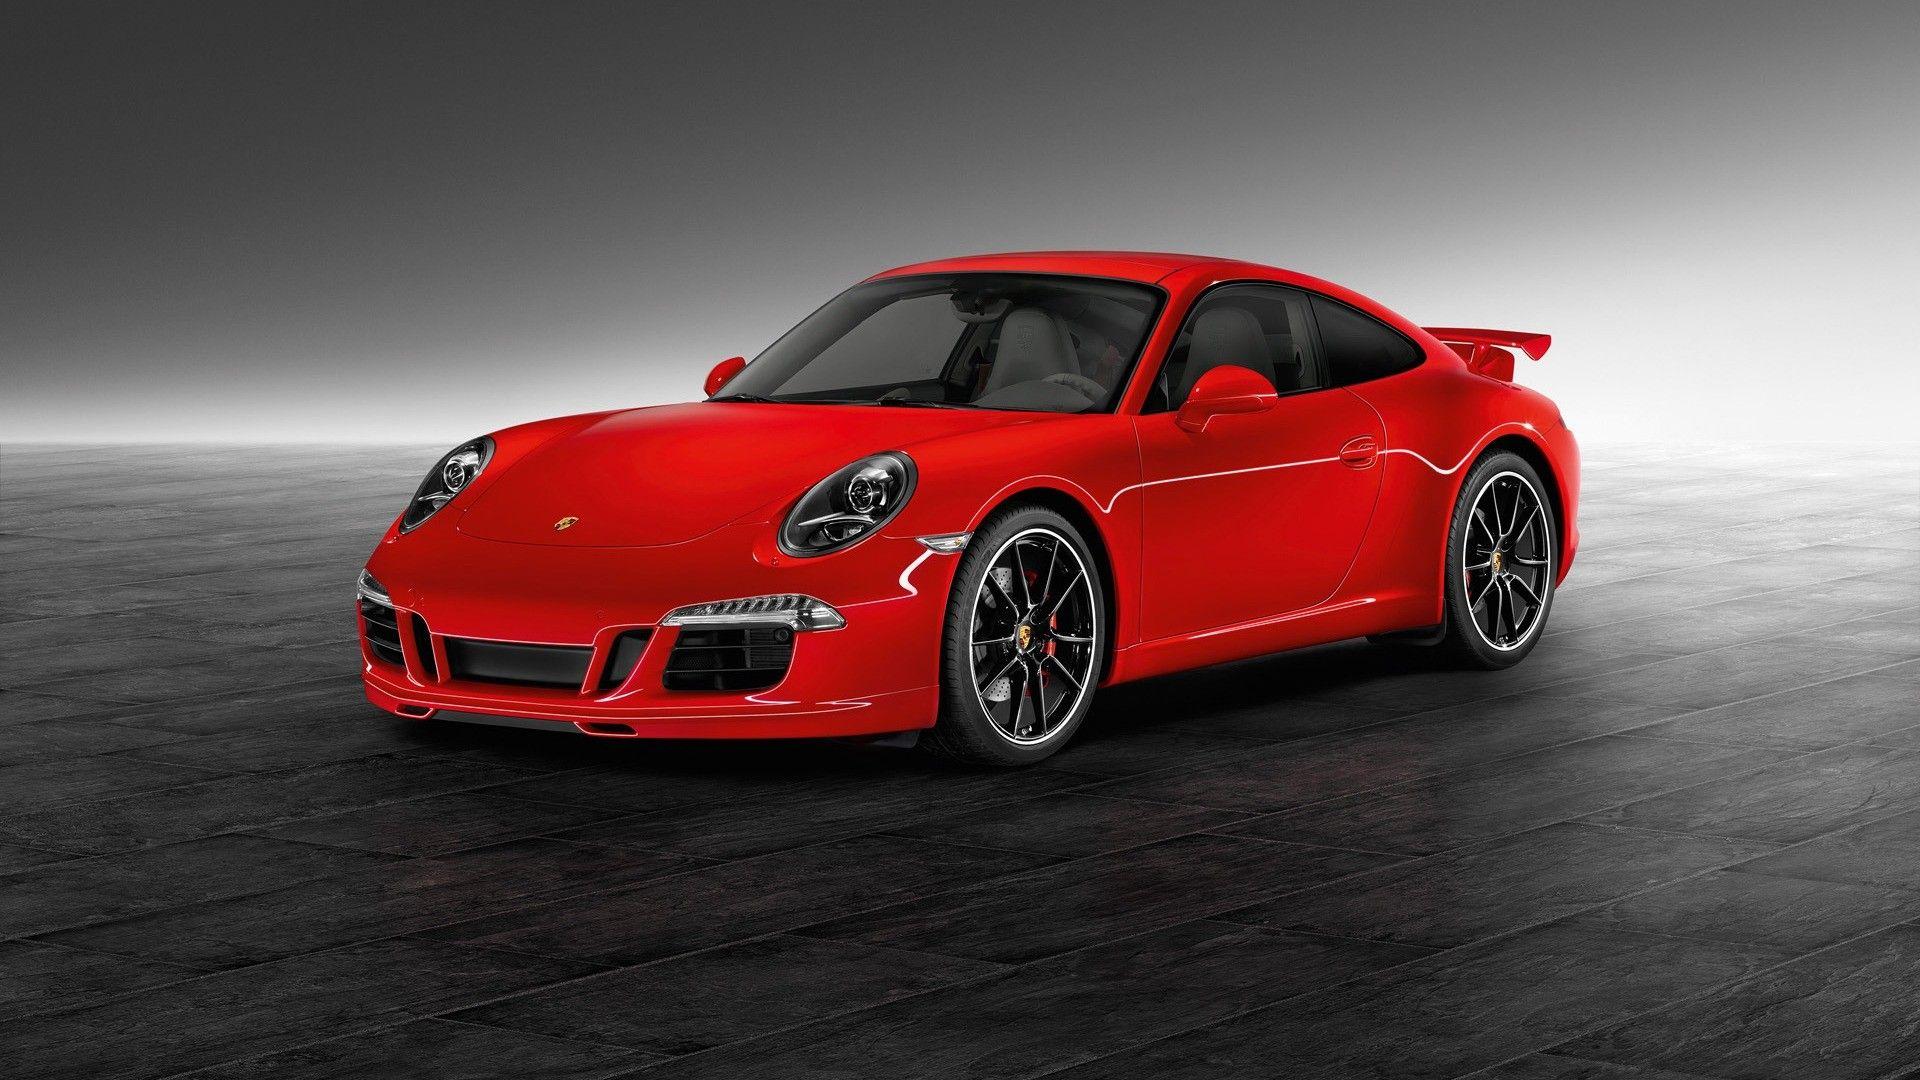 Porsche 911 Red Wallpapers   Top Porsche 911 Red Backgrounds 1920x1080